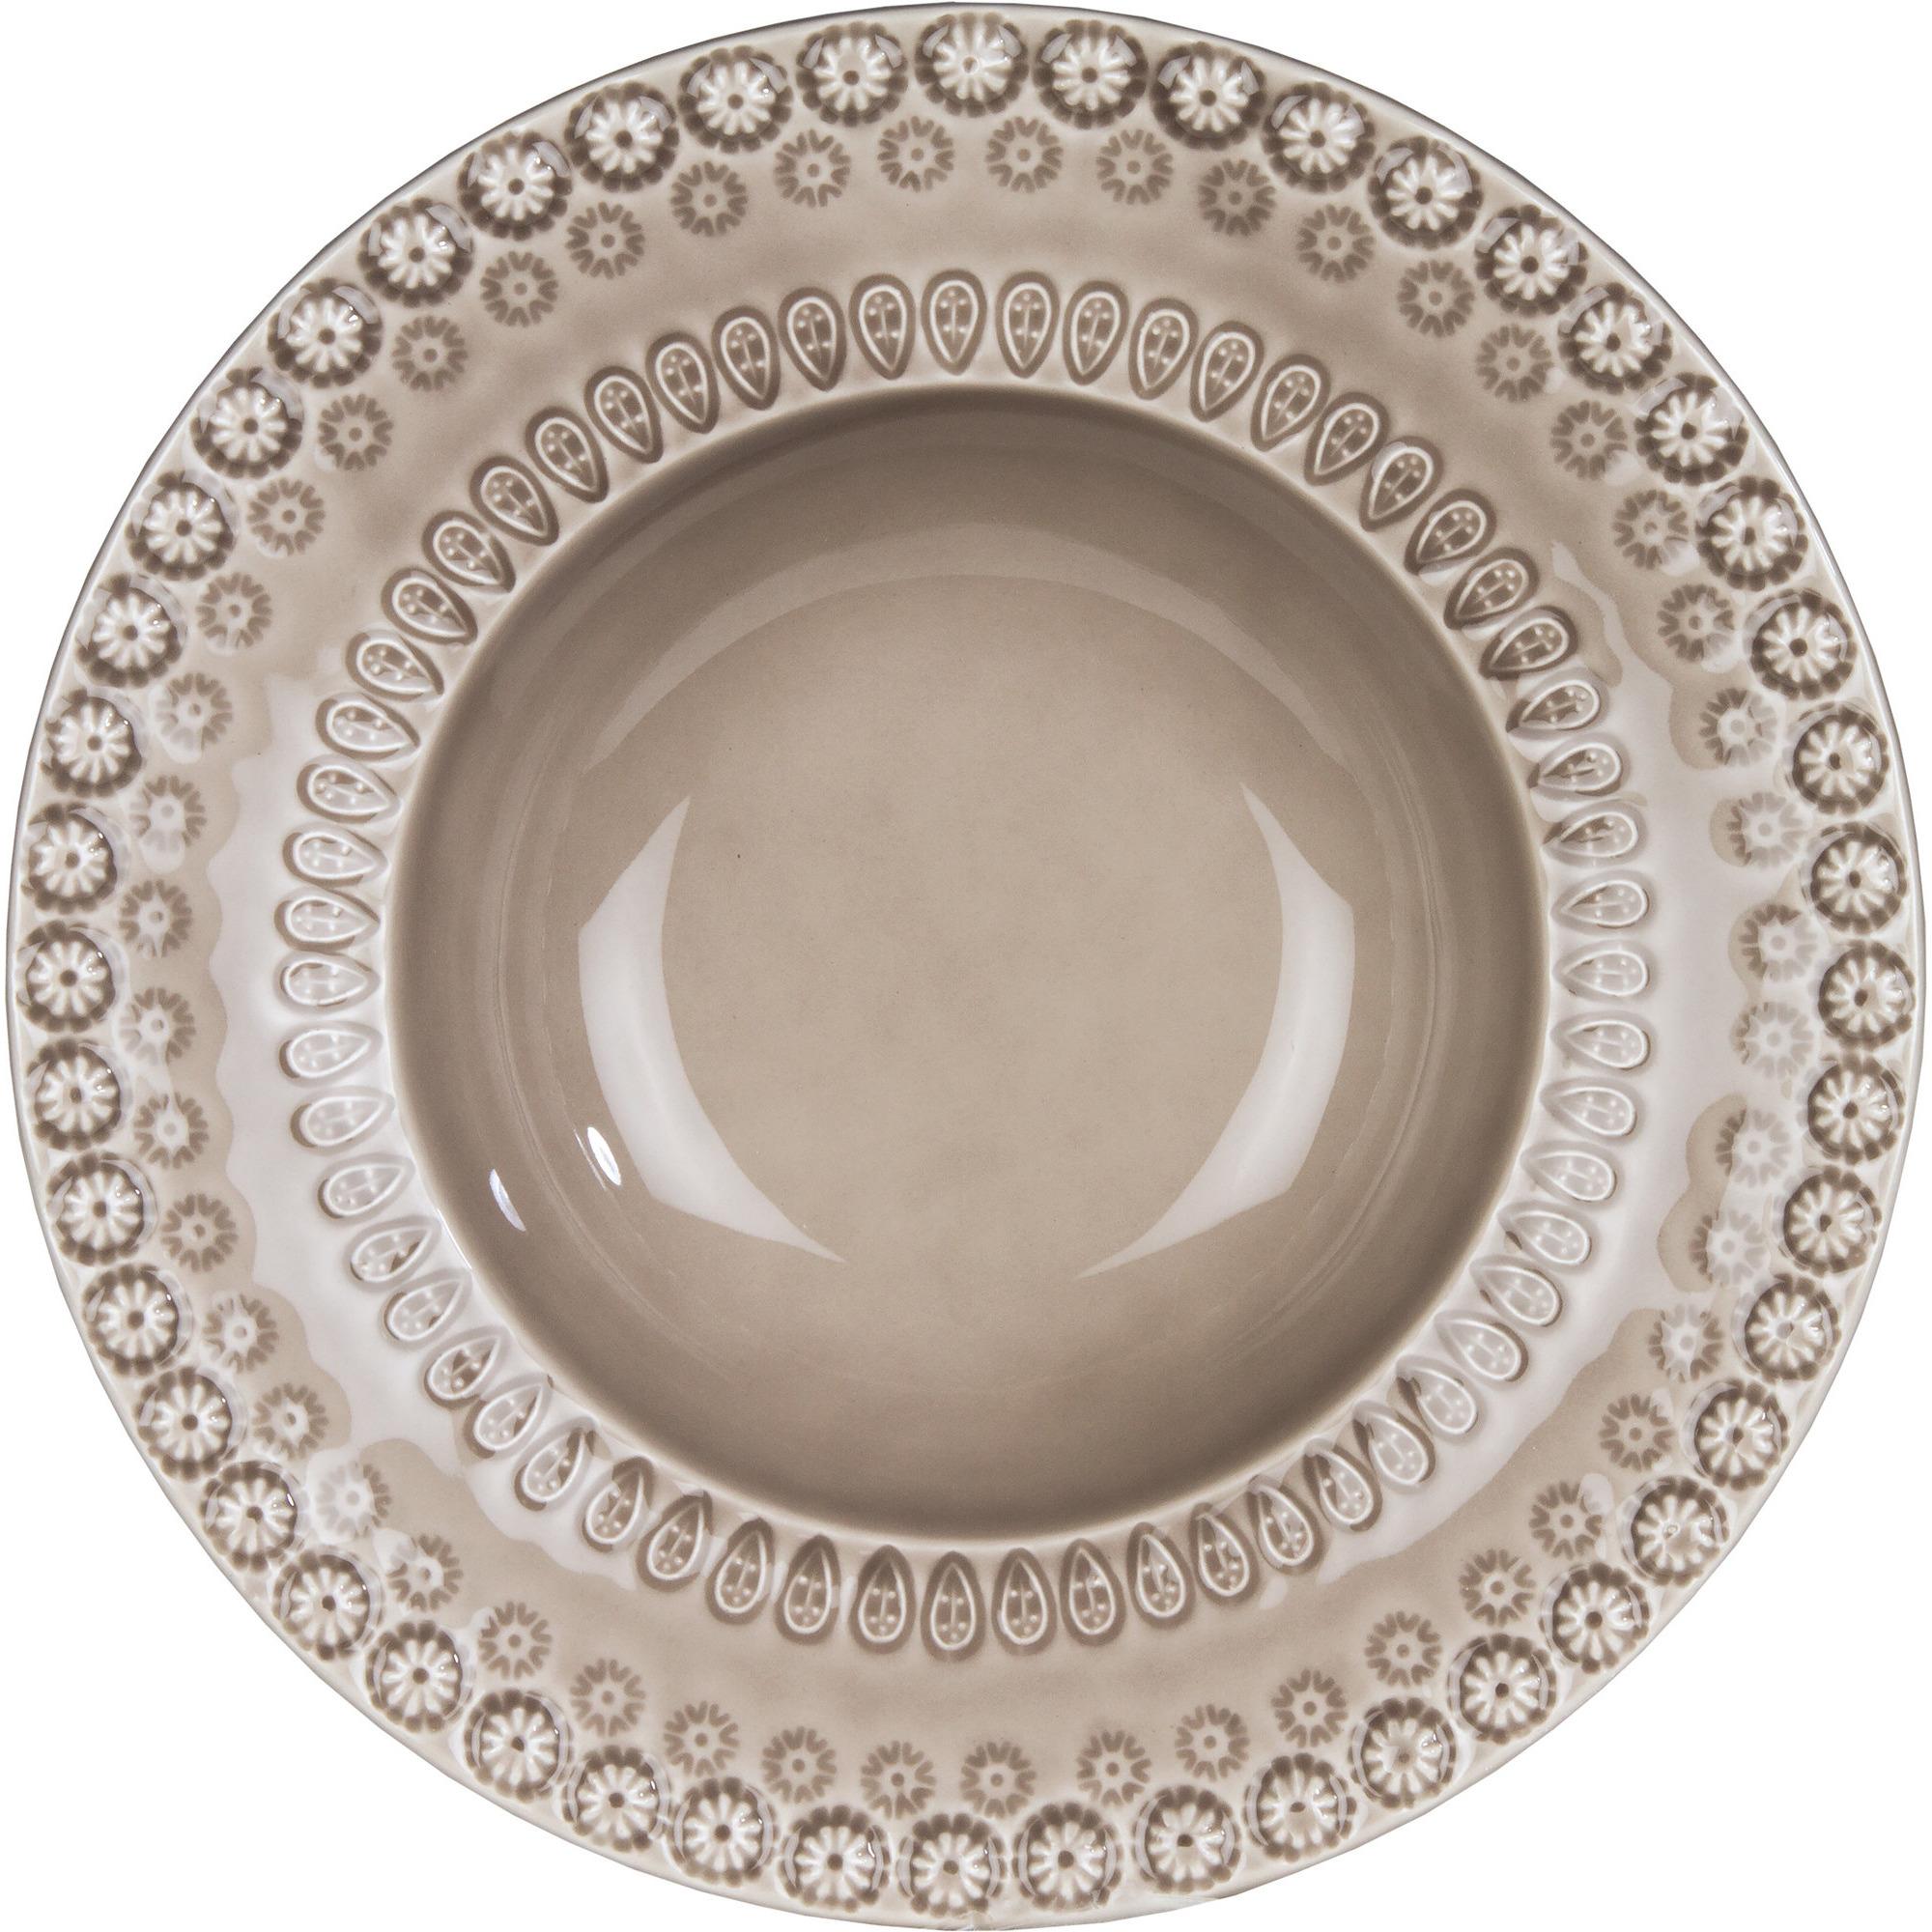 PotteryJo Daisy Soppskål 21 cm Greige